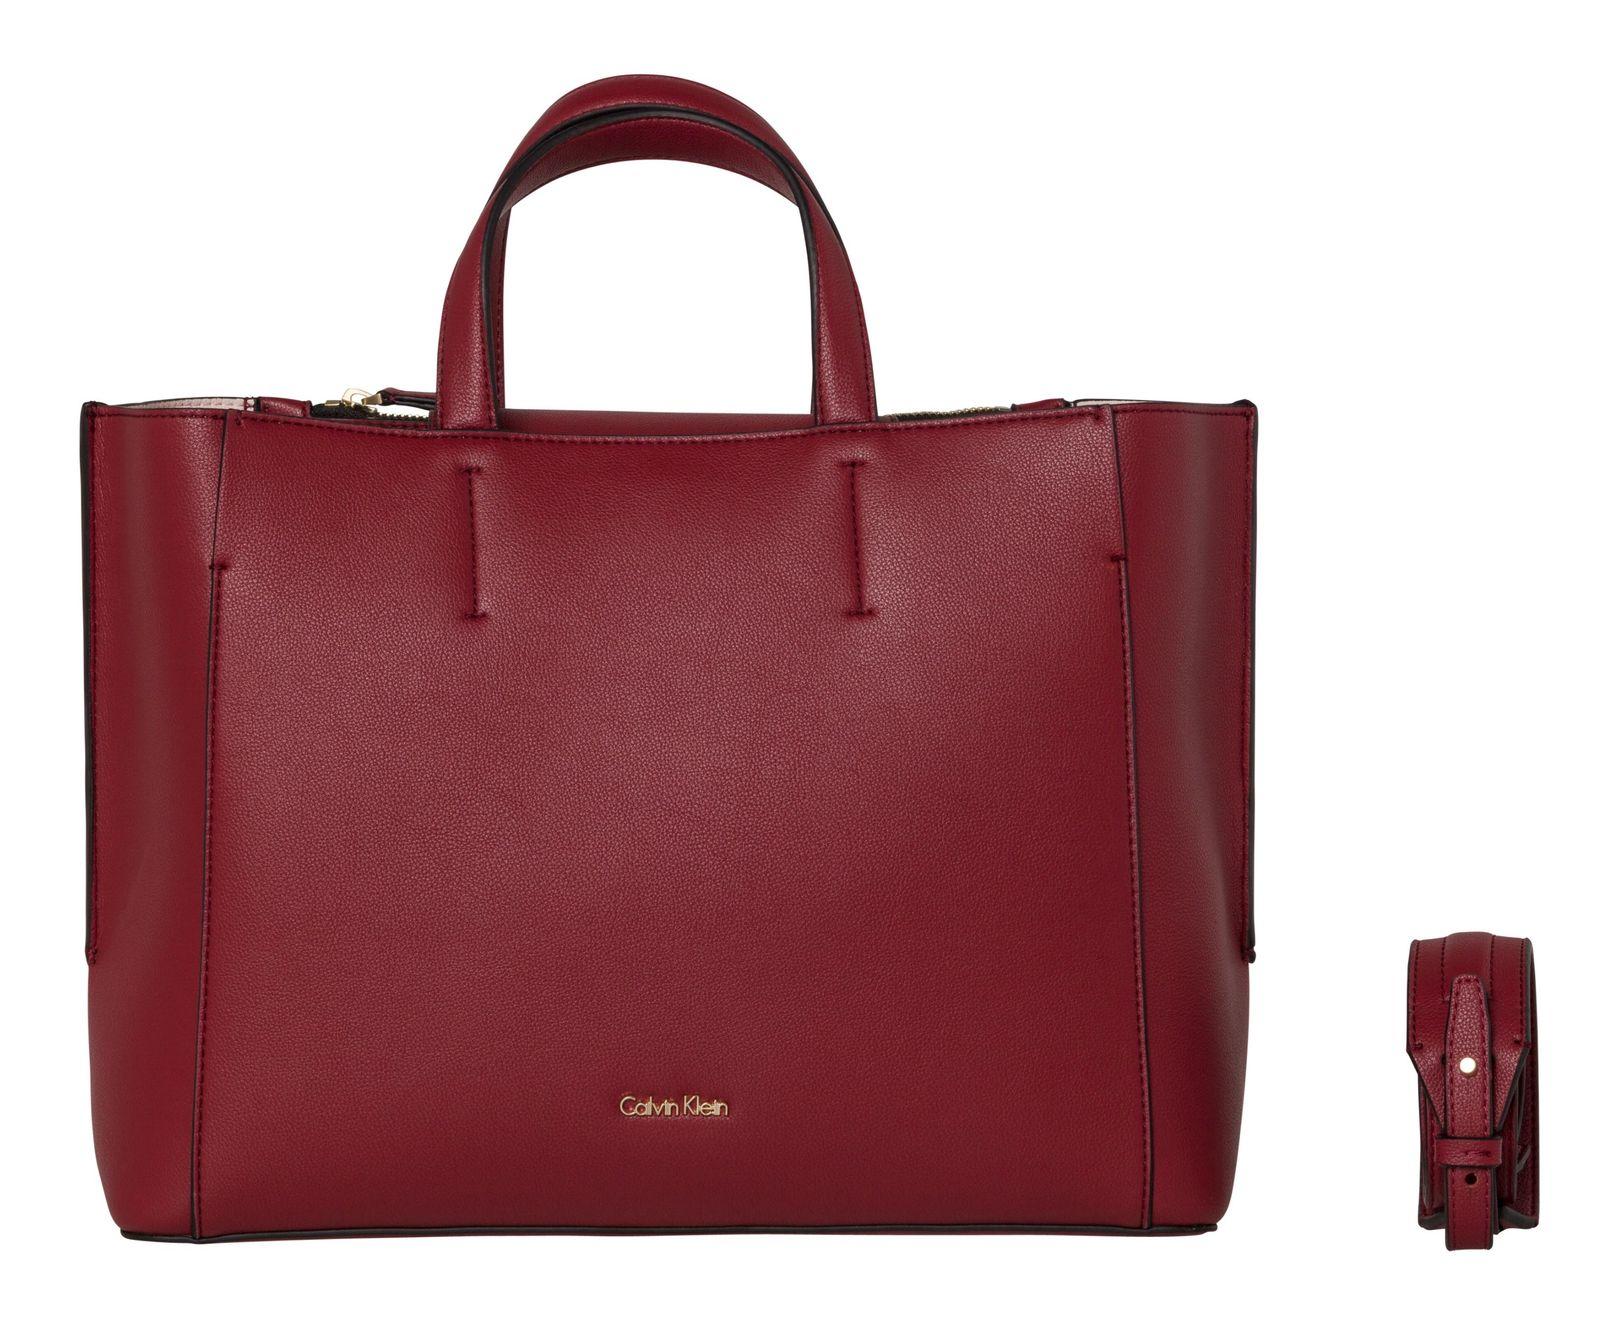 3707940f552c Calvin Klein Handbag Metropolitan Tote